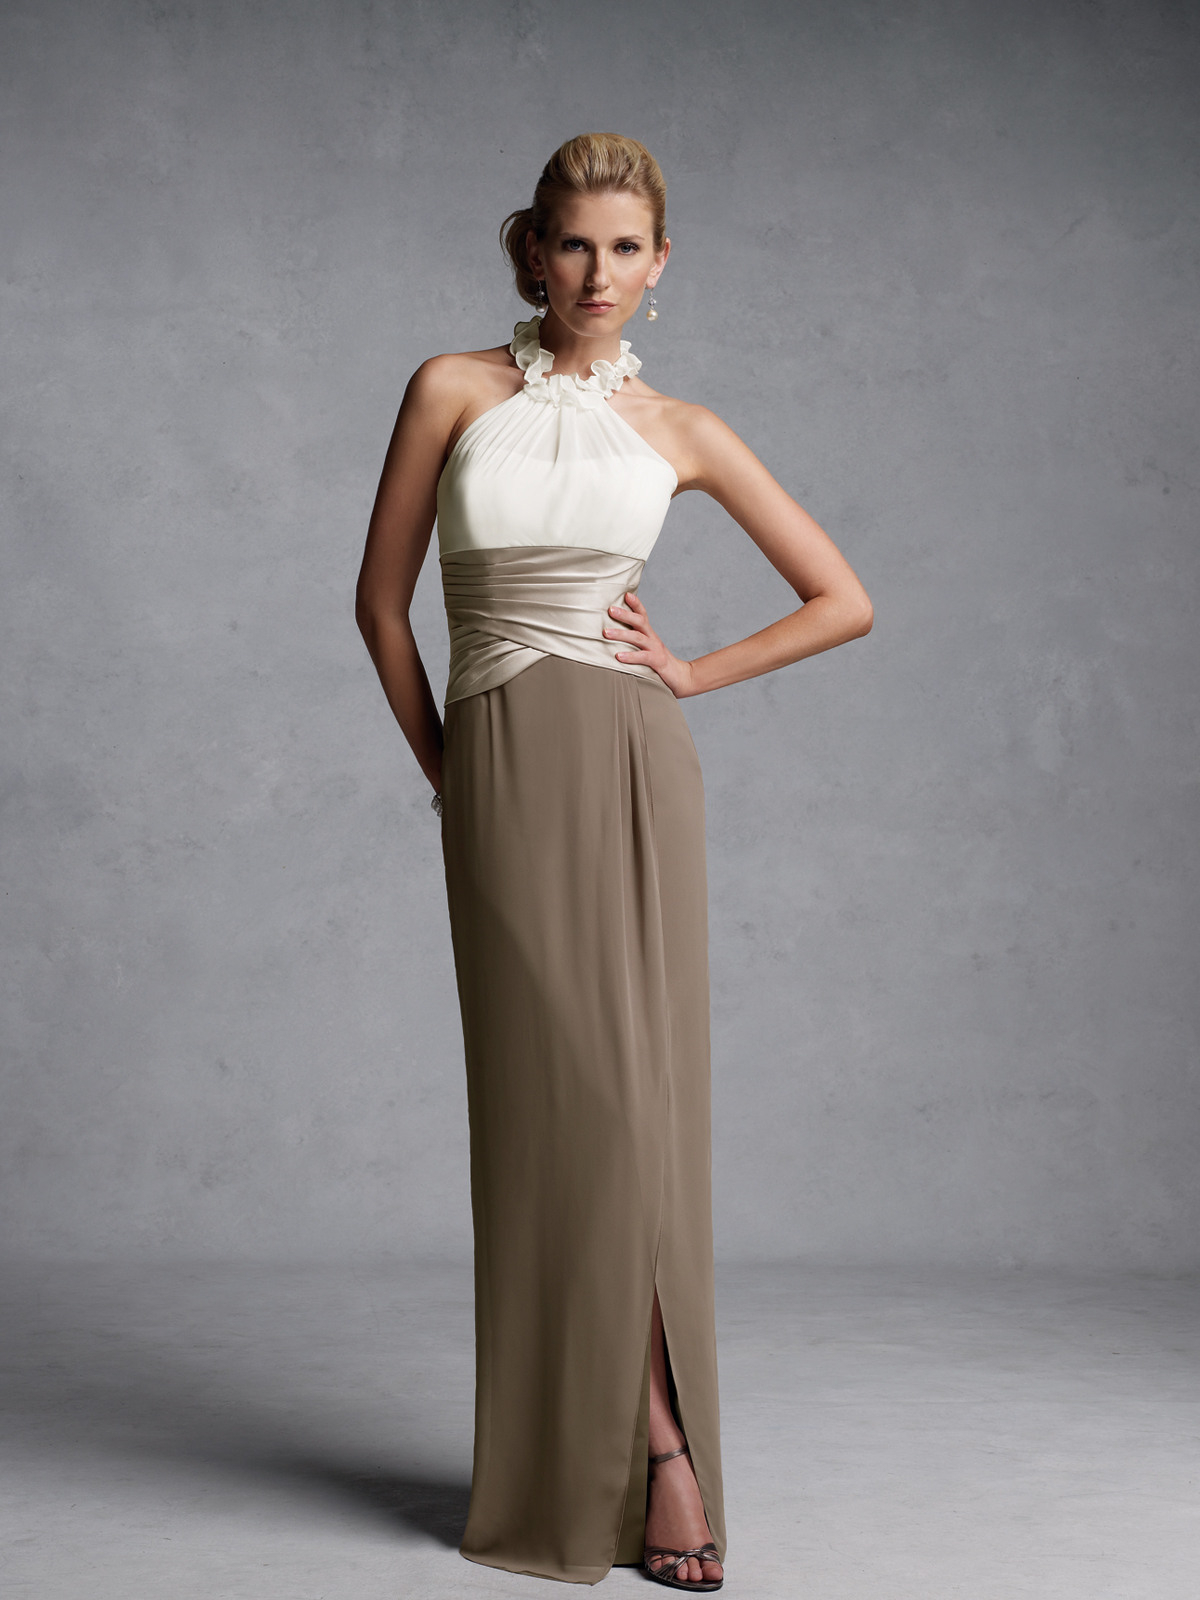 15 Genial Neckholder Abendkleid Lang Spezialgebiet17 Perfekt Neckholder Abendkleid Lang Stylish